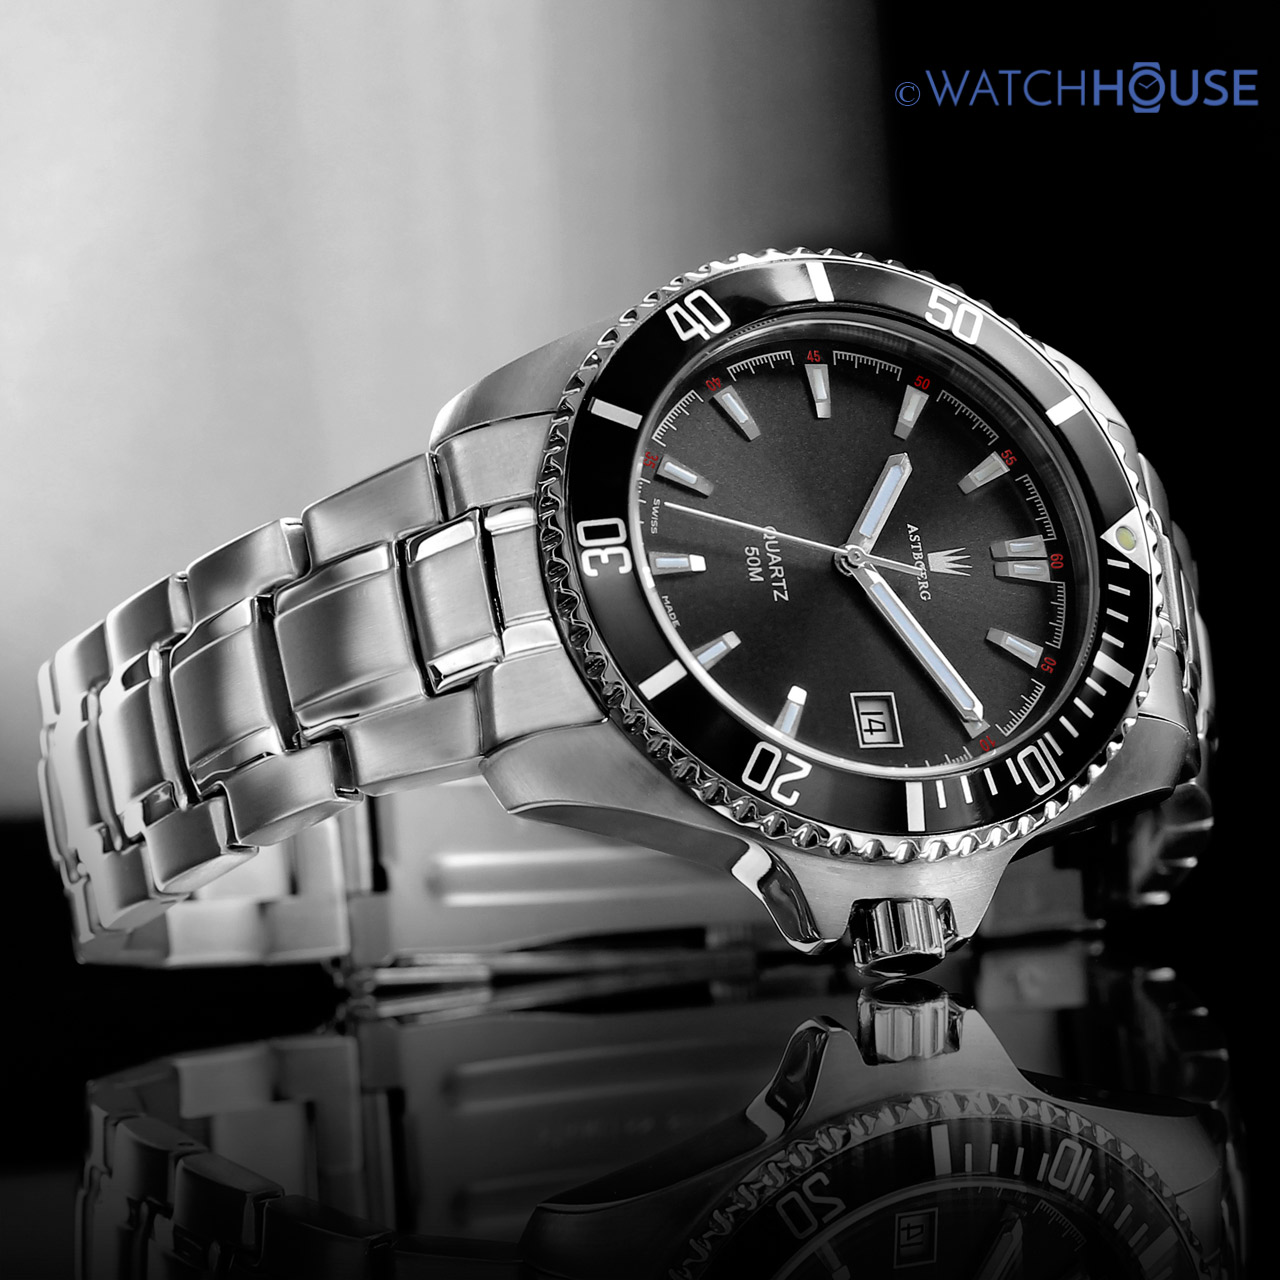 Astboerg Ocean AT2703MS Swiss Made Herren Armbanduhr